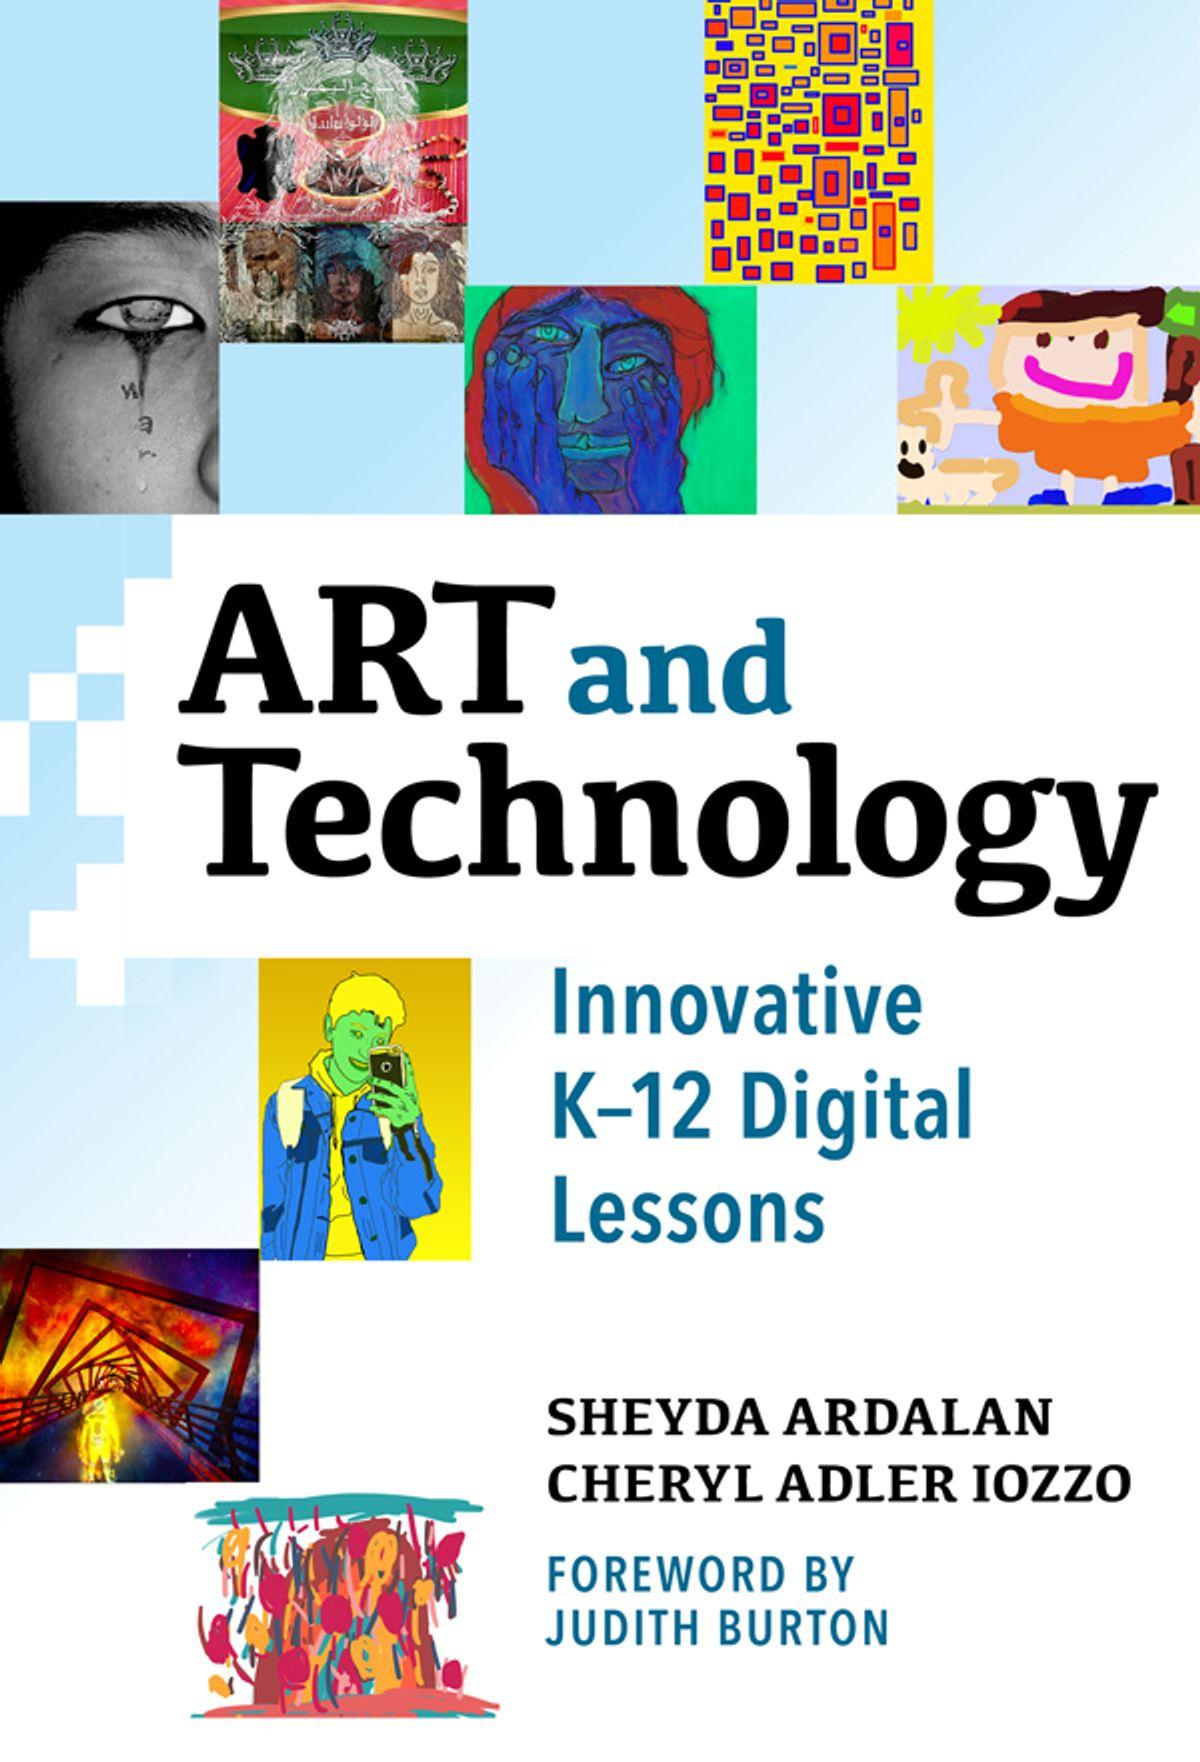 Art and technology : innovative K-12 digital lessons